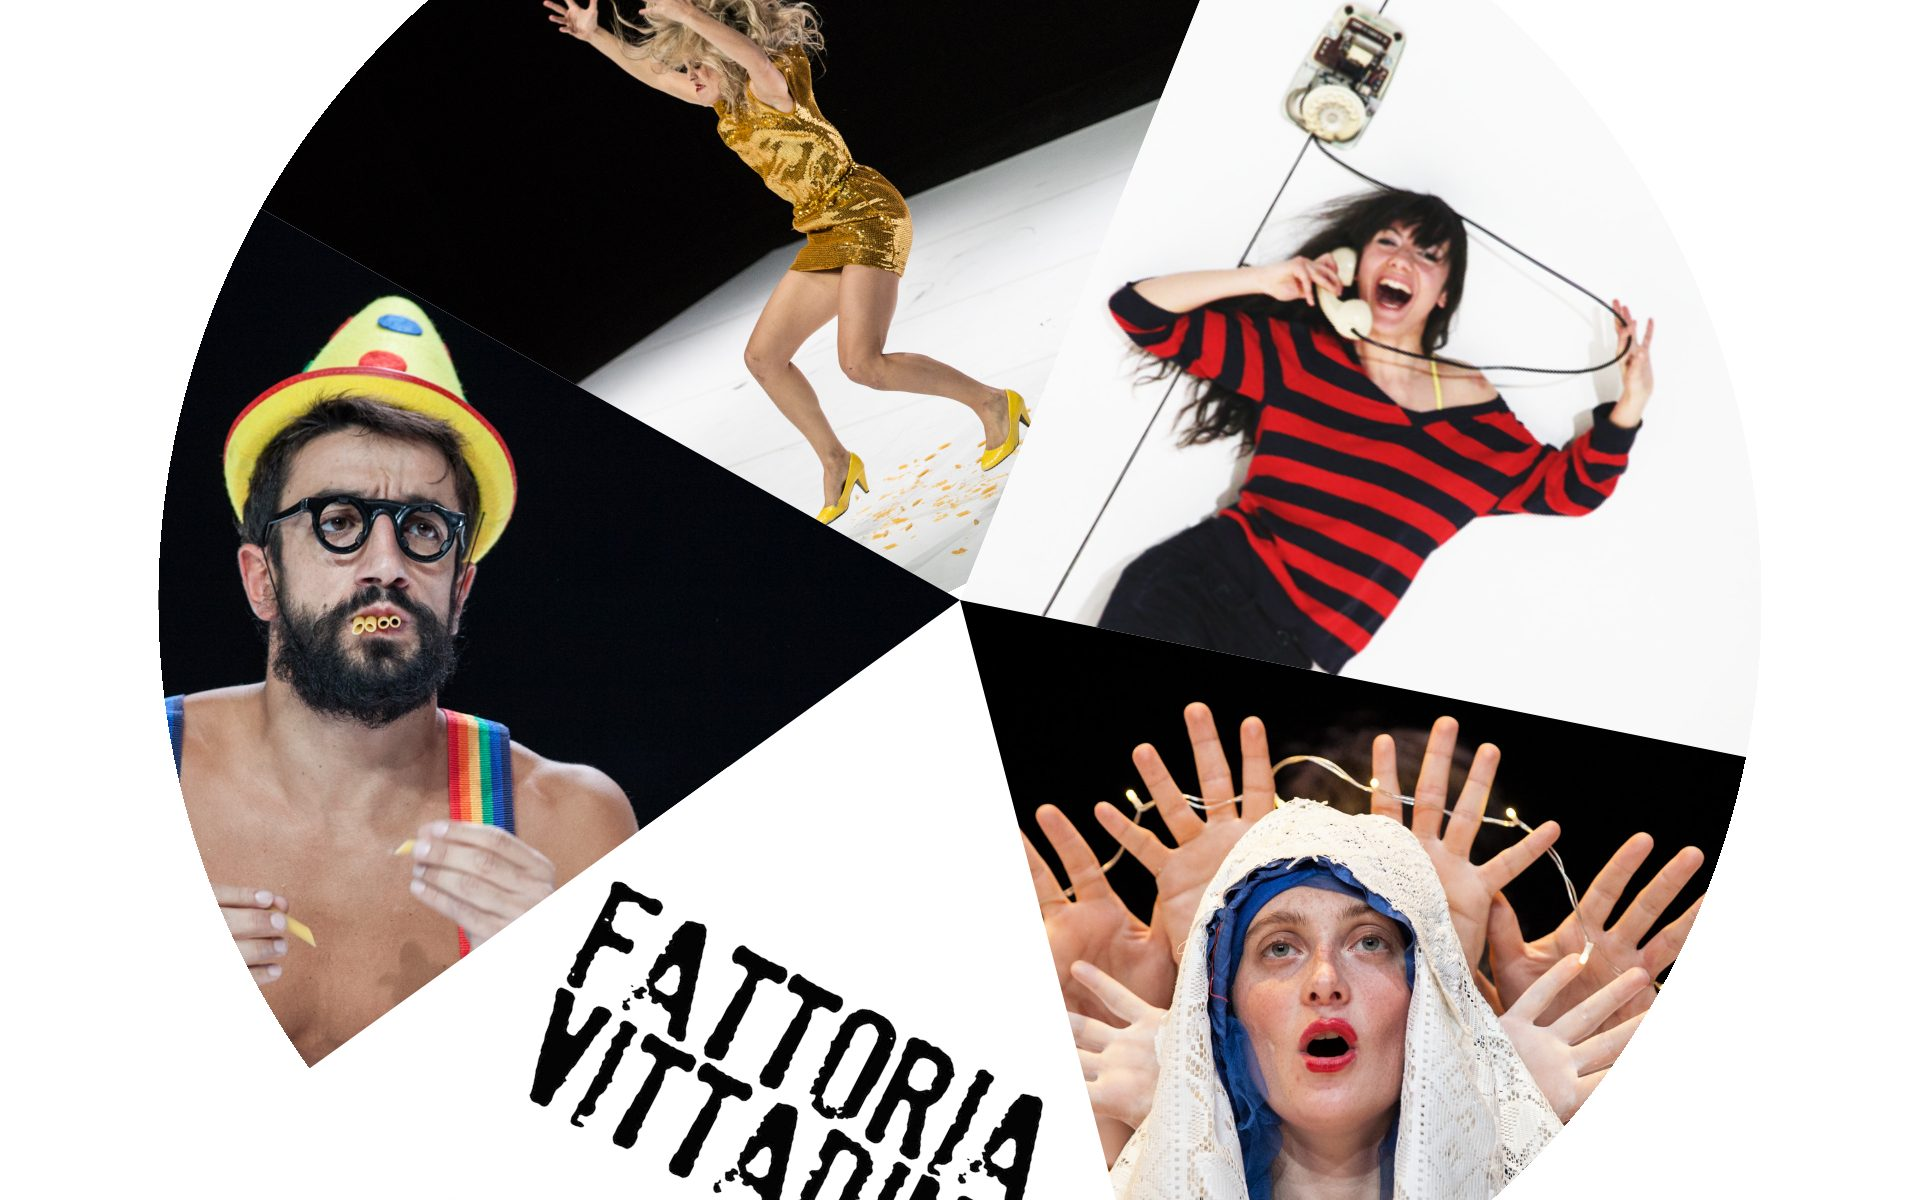 Kaleidos Fattoria Vittadini